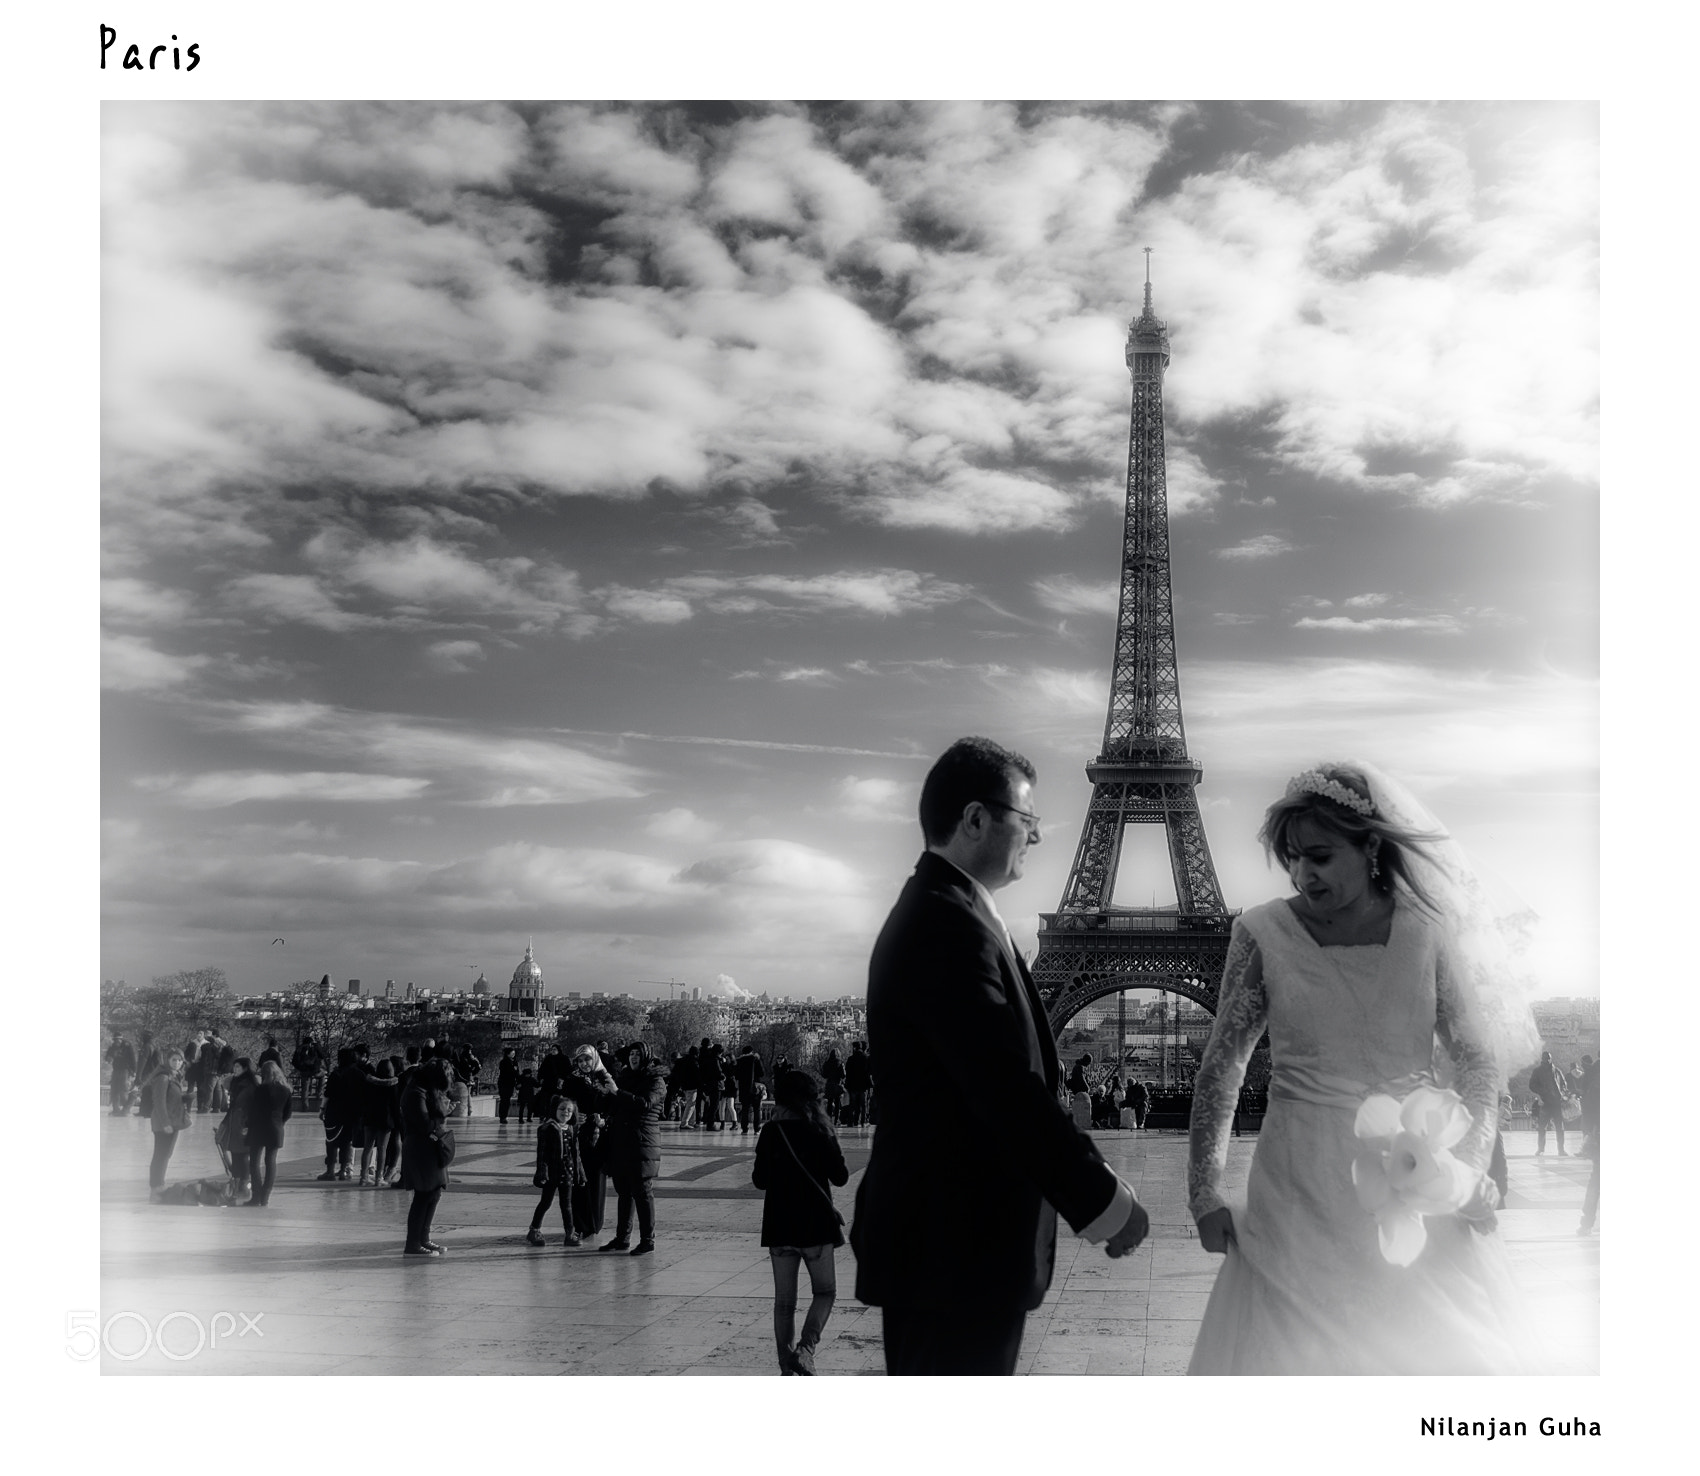 Photograph Untitled by Nilanjan Guha on 500px